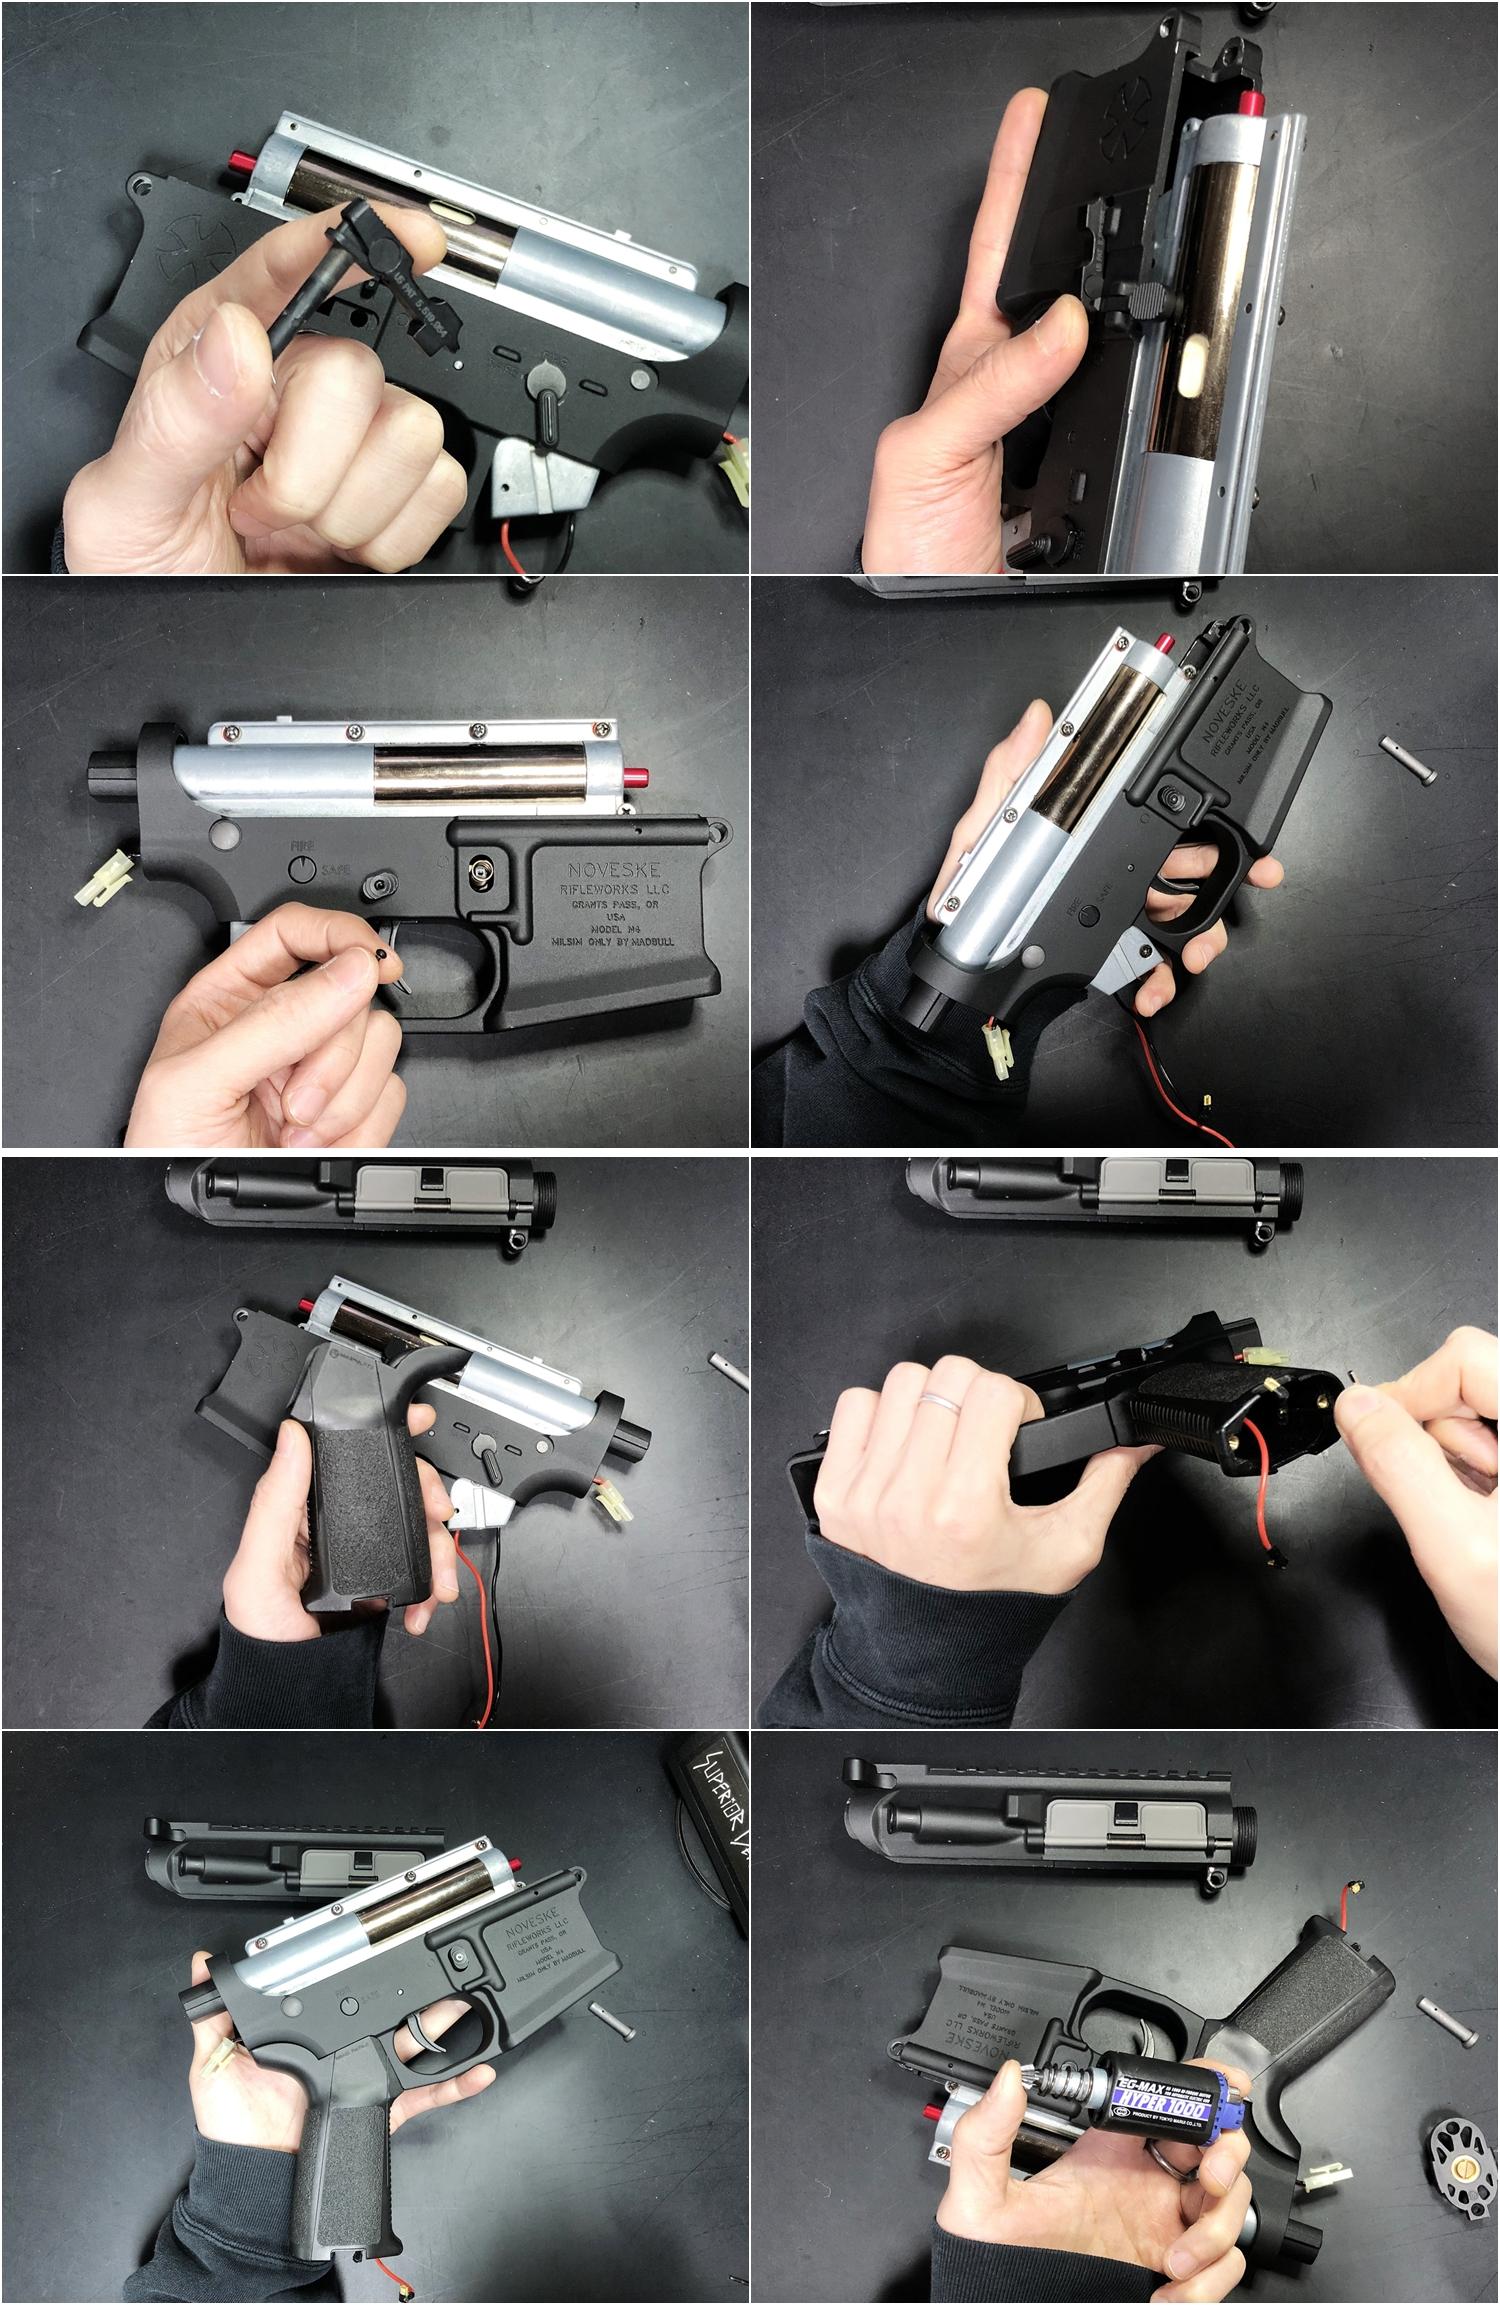 14 NOVESKE GEN3 N4 BY MADBULL!! 『第一弾』 新たにSTD民間系ARを作り始めたいと思います!! STD AR-15 M4 スタンダード 電動ガン マルイ ノベスケ ノベスキー マットブル メタルフレーム 動作テスト 組込 取付 カス